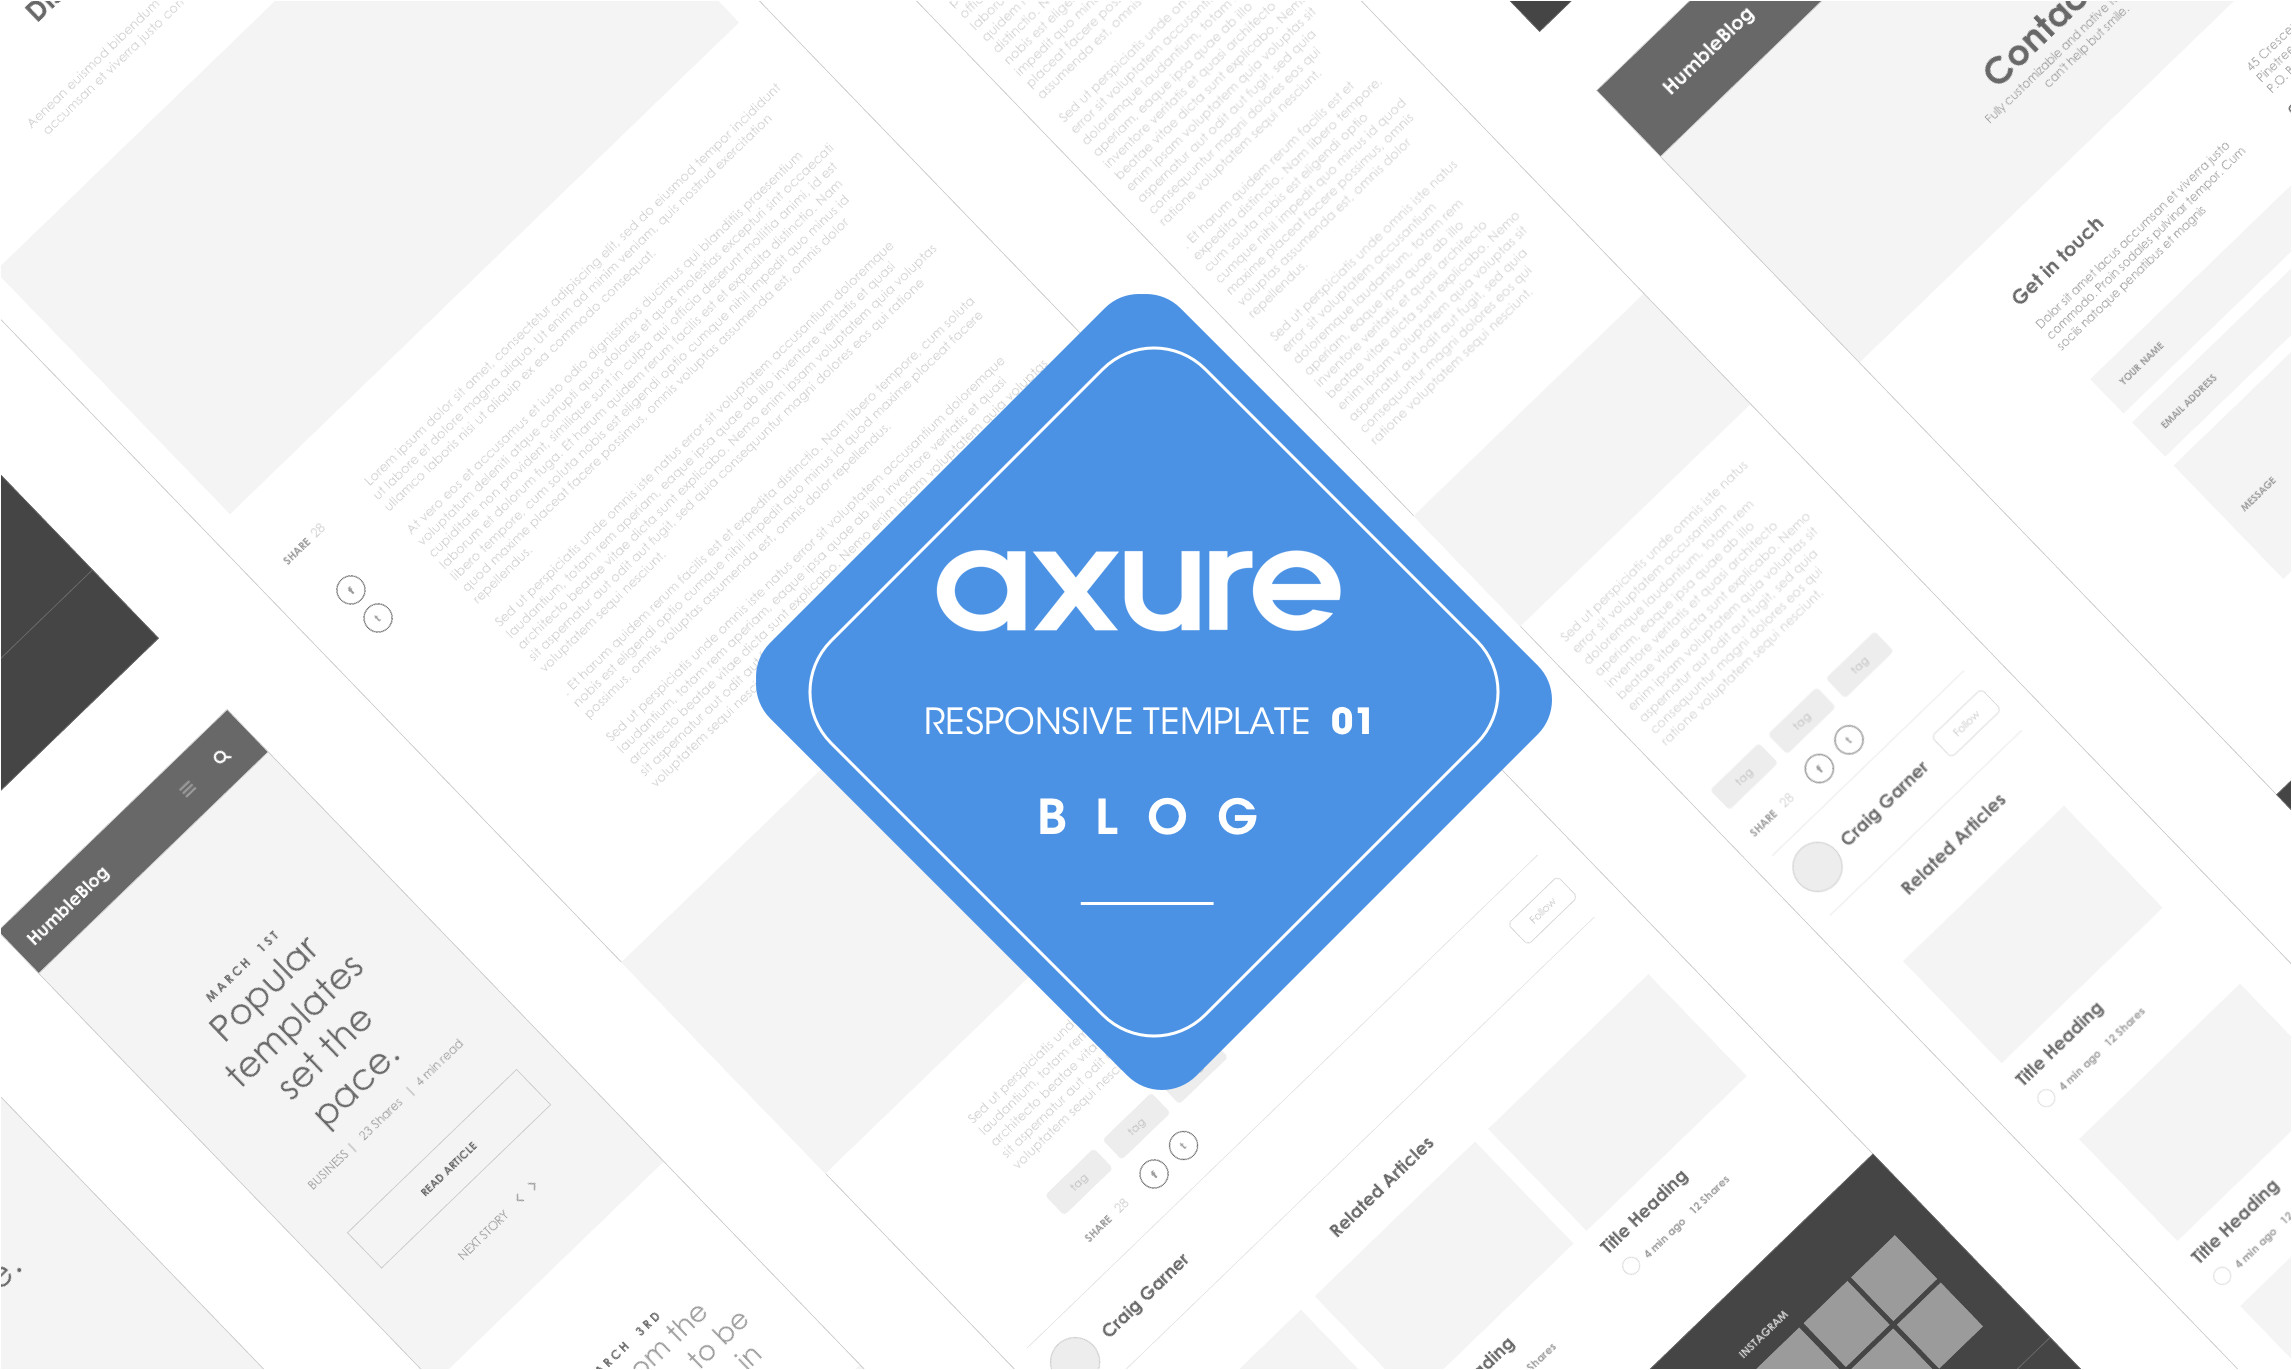 axure responsive template blog website 1